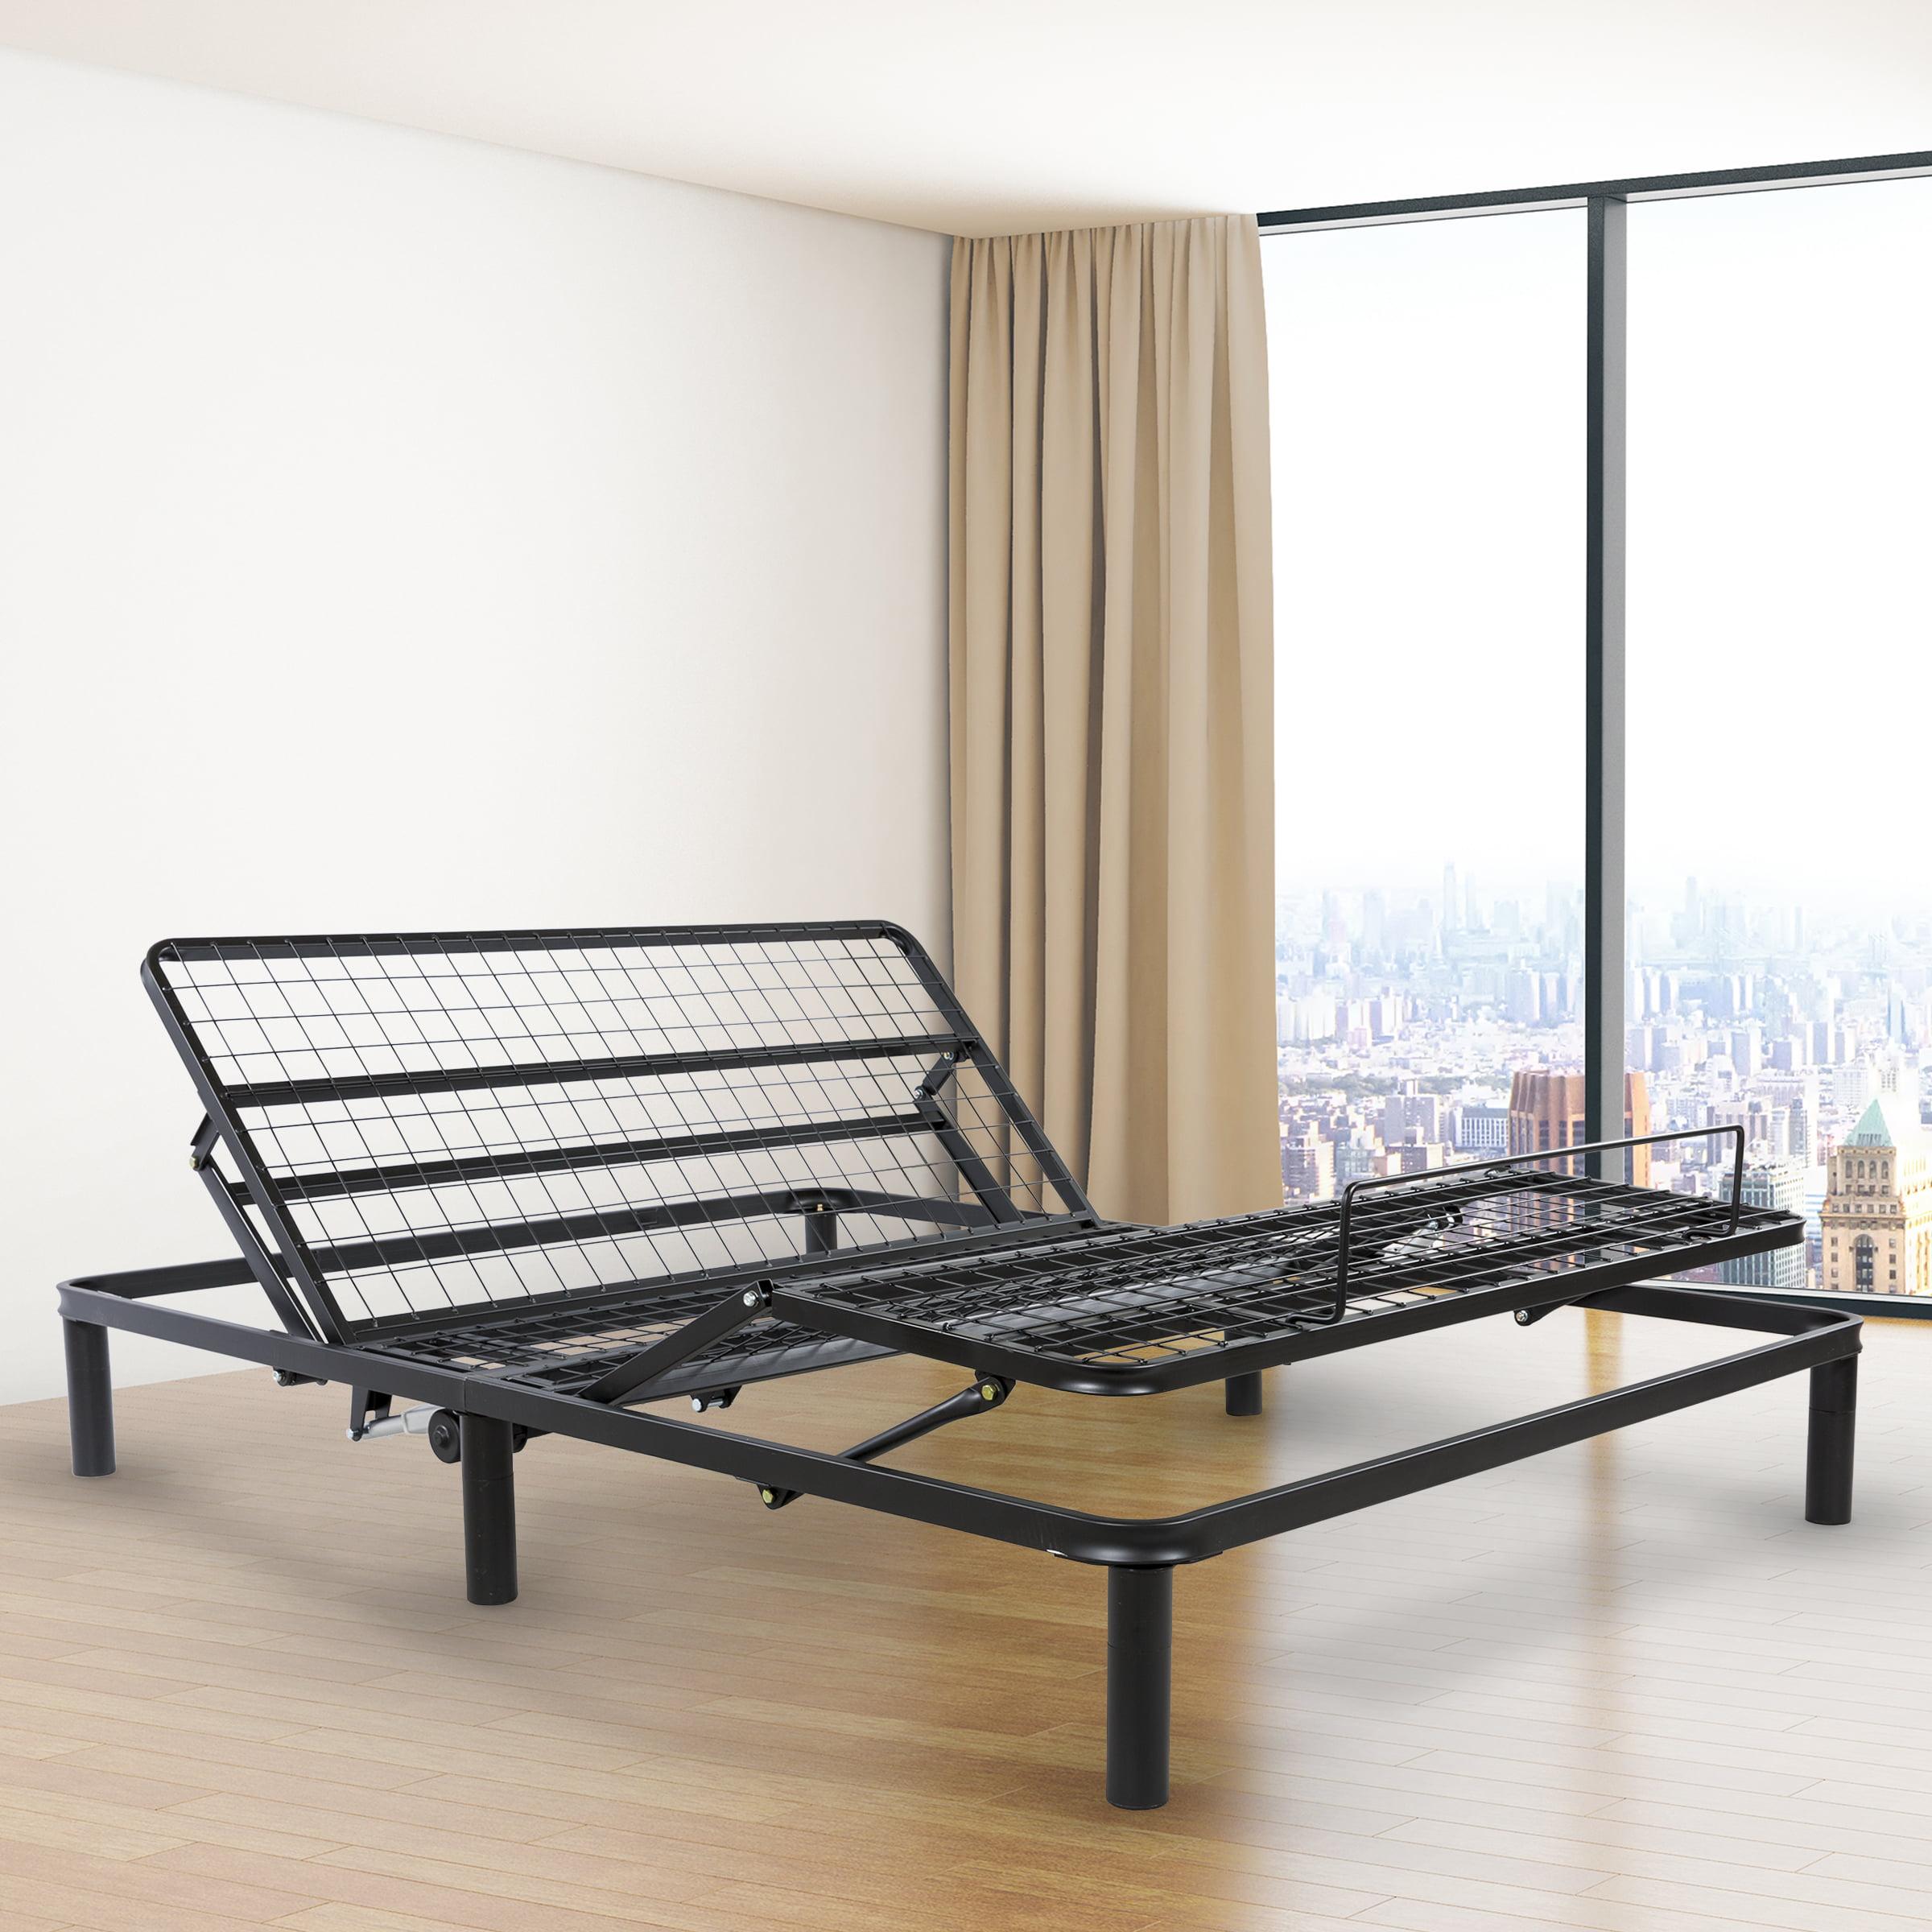 Primo International Adjustable Metal Bed Charger, Multiple Sizes